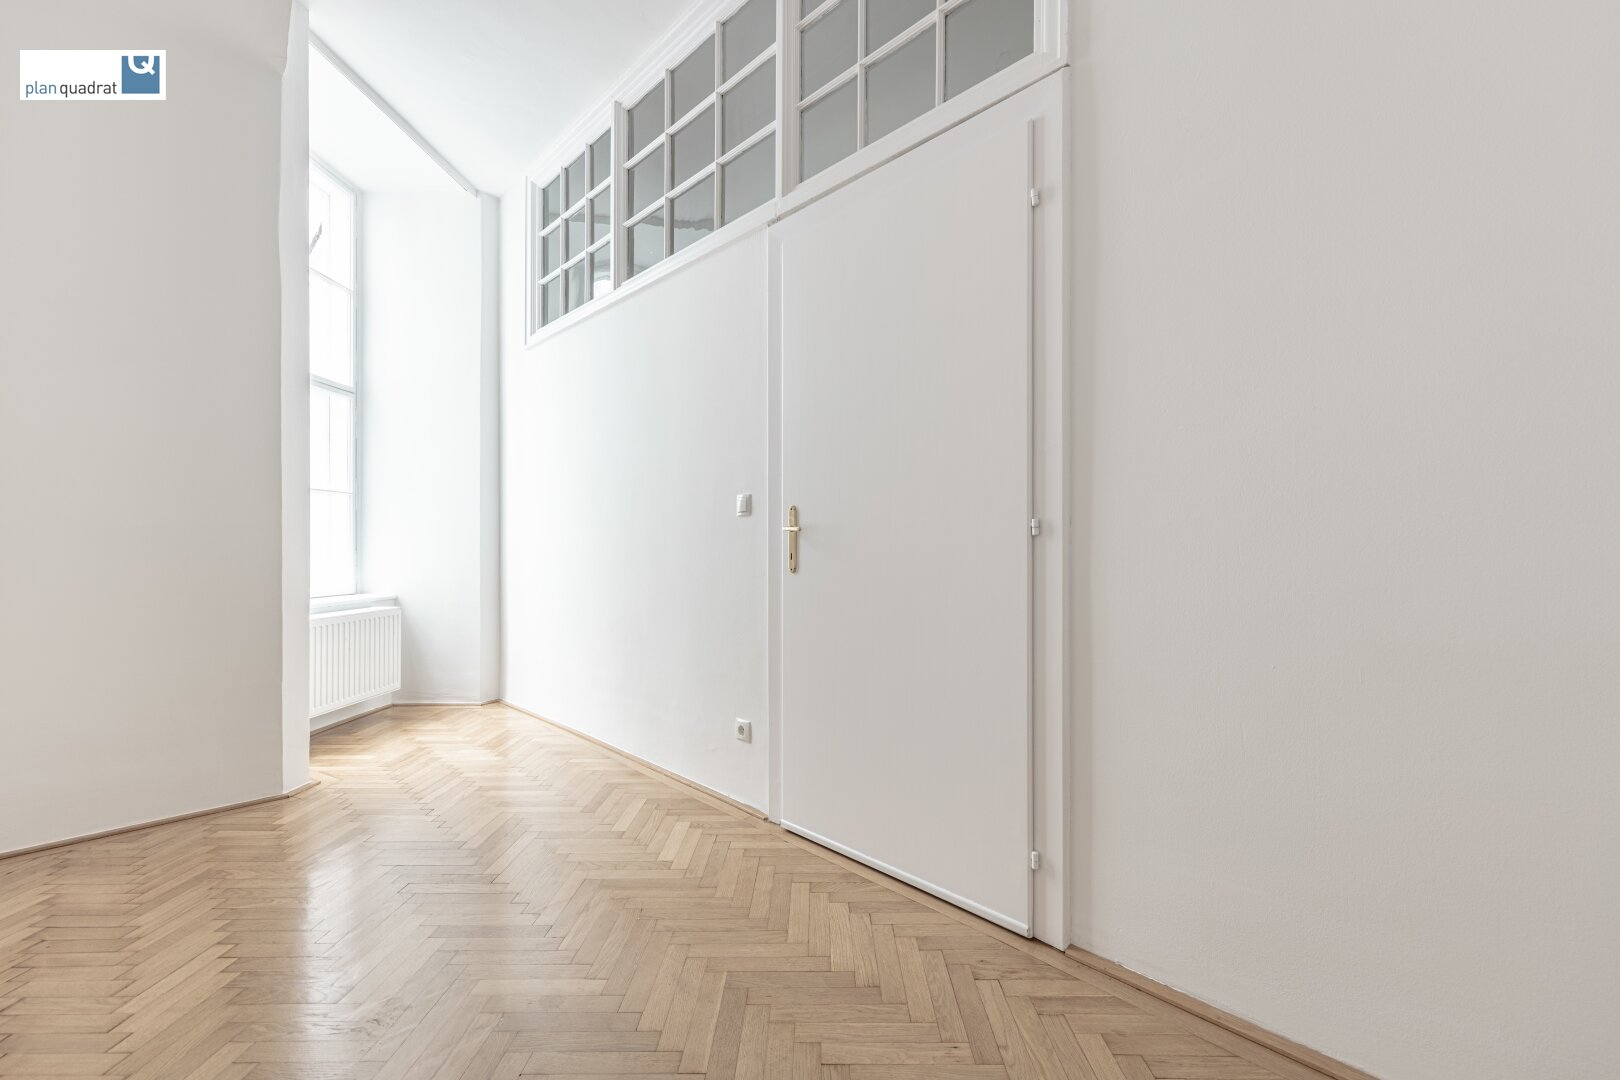 Zimmer 5 (ca. 10,00 m²) gem. Grundriss